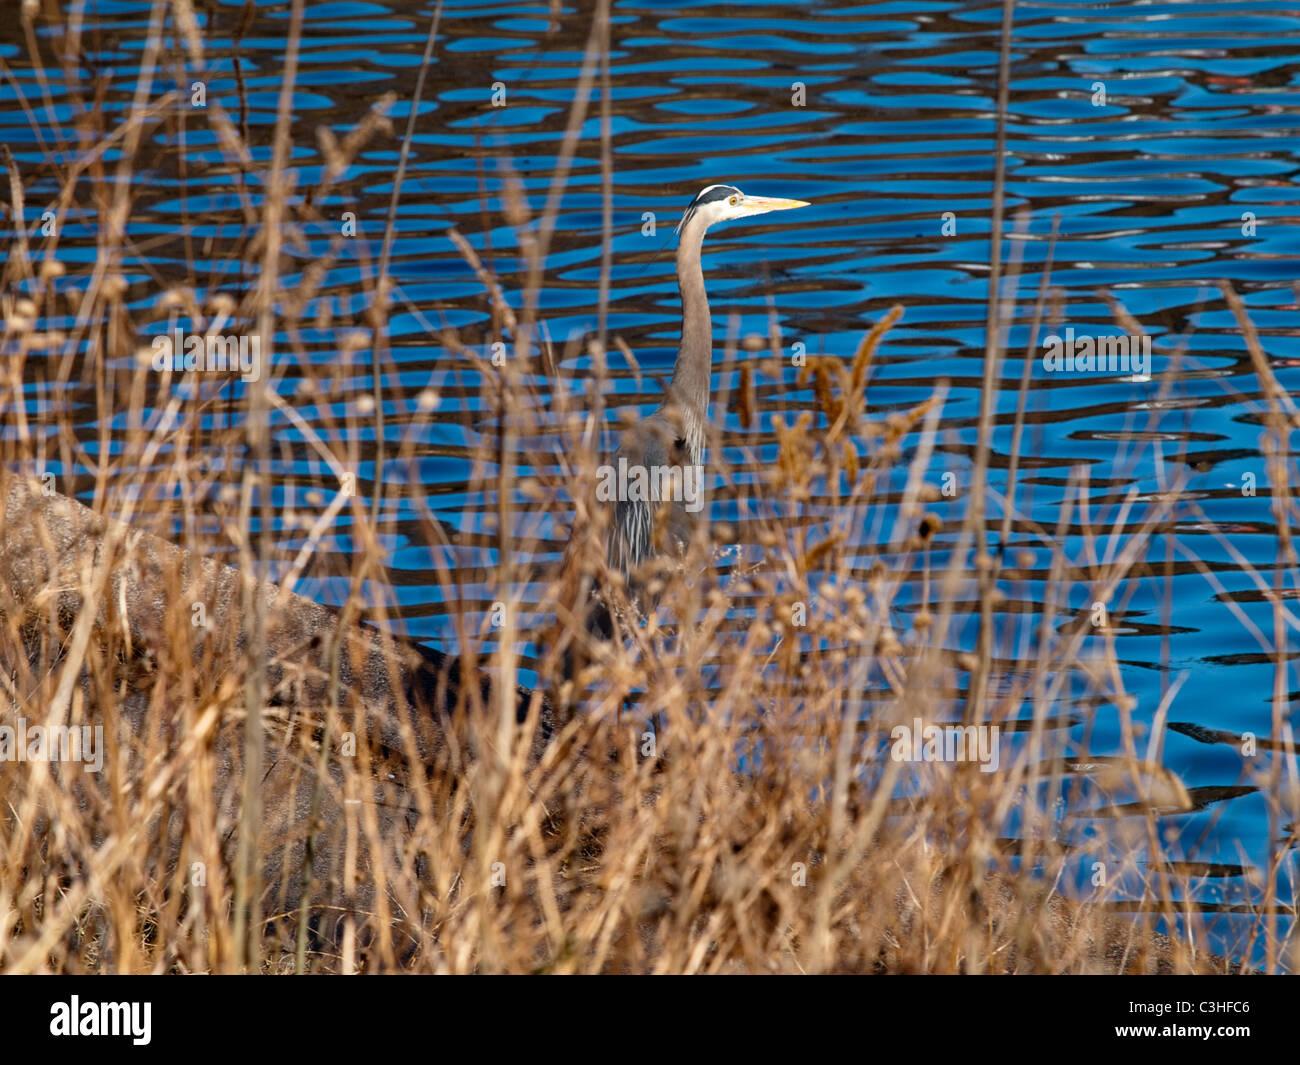 great blue heron at Powderhorn Lake, Minneapolis, MN, USA, May 2011 - Stock Image